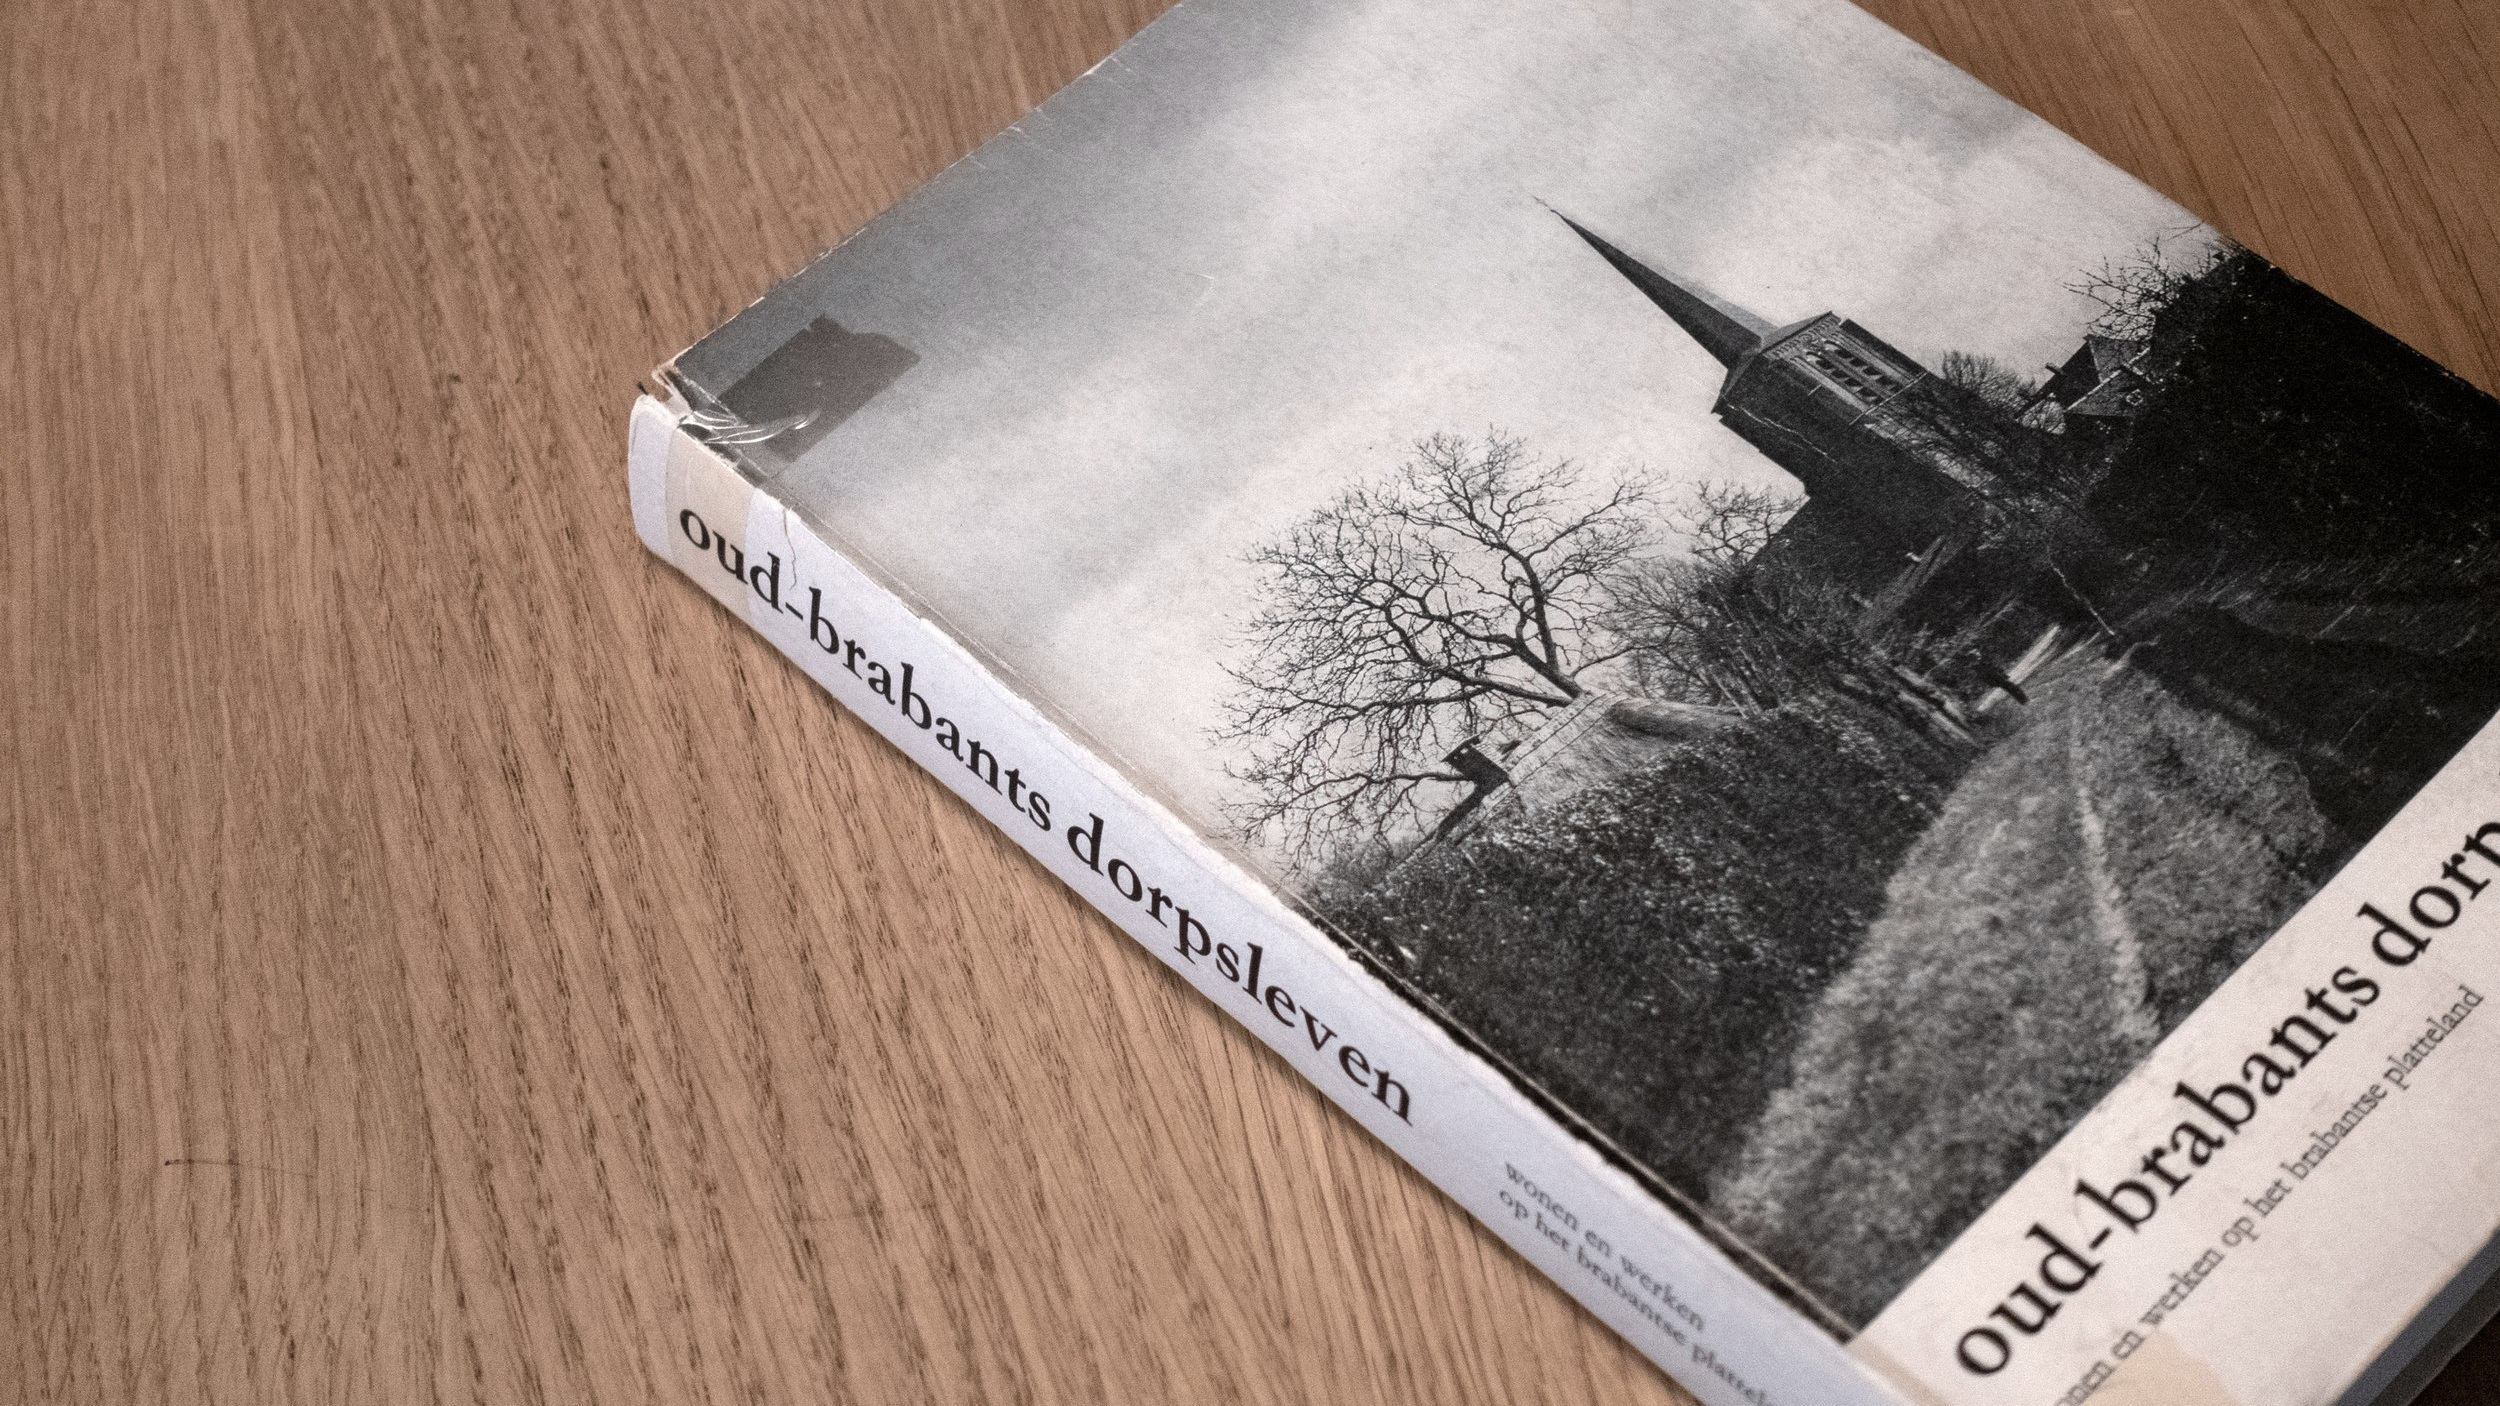 Oud Brabants Dorpsleven uit 1972.